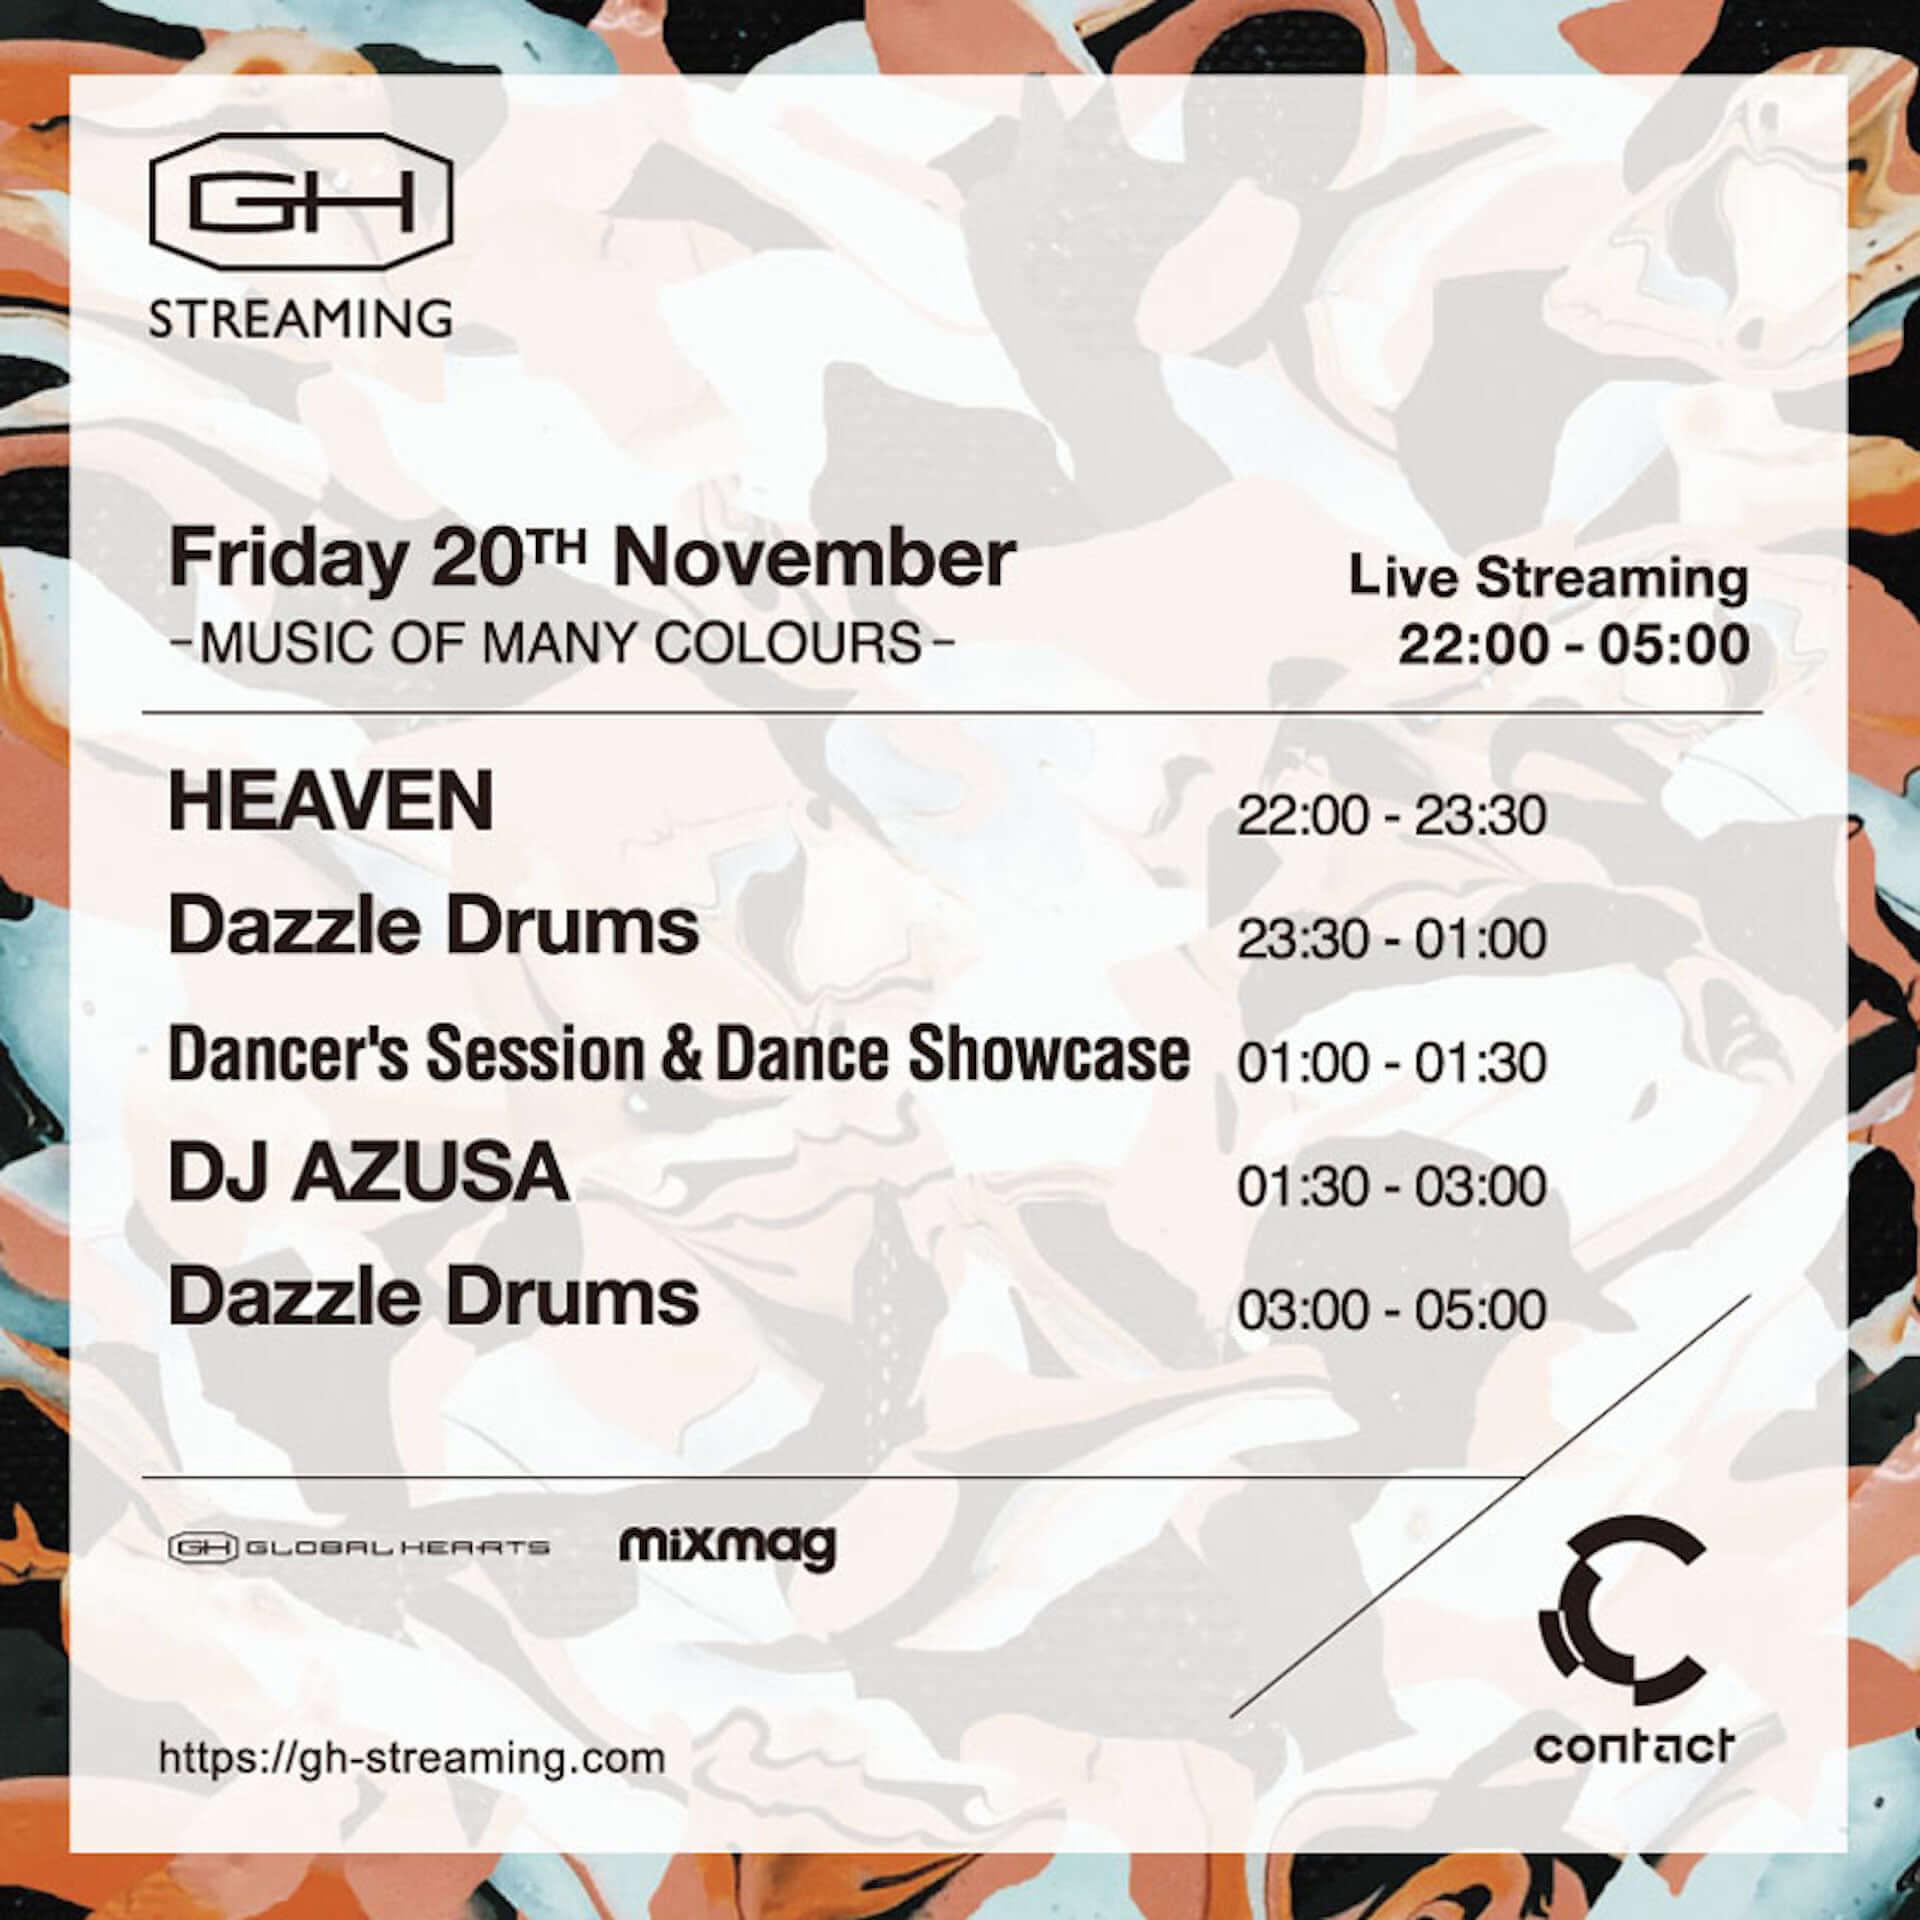 Dazzle Drums主催ハウスパーティー<Music Of Many Colours>が渋谷Contactで開催決定!DJ Azusa、TOYODAらが登場 music201112_contact_4-1920x1920